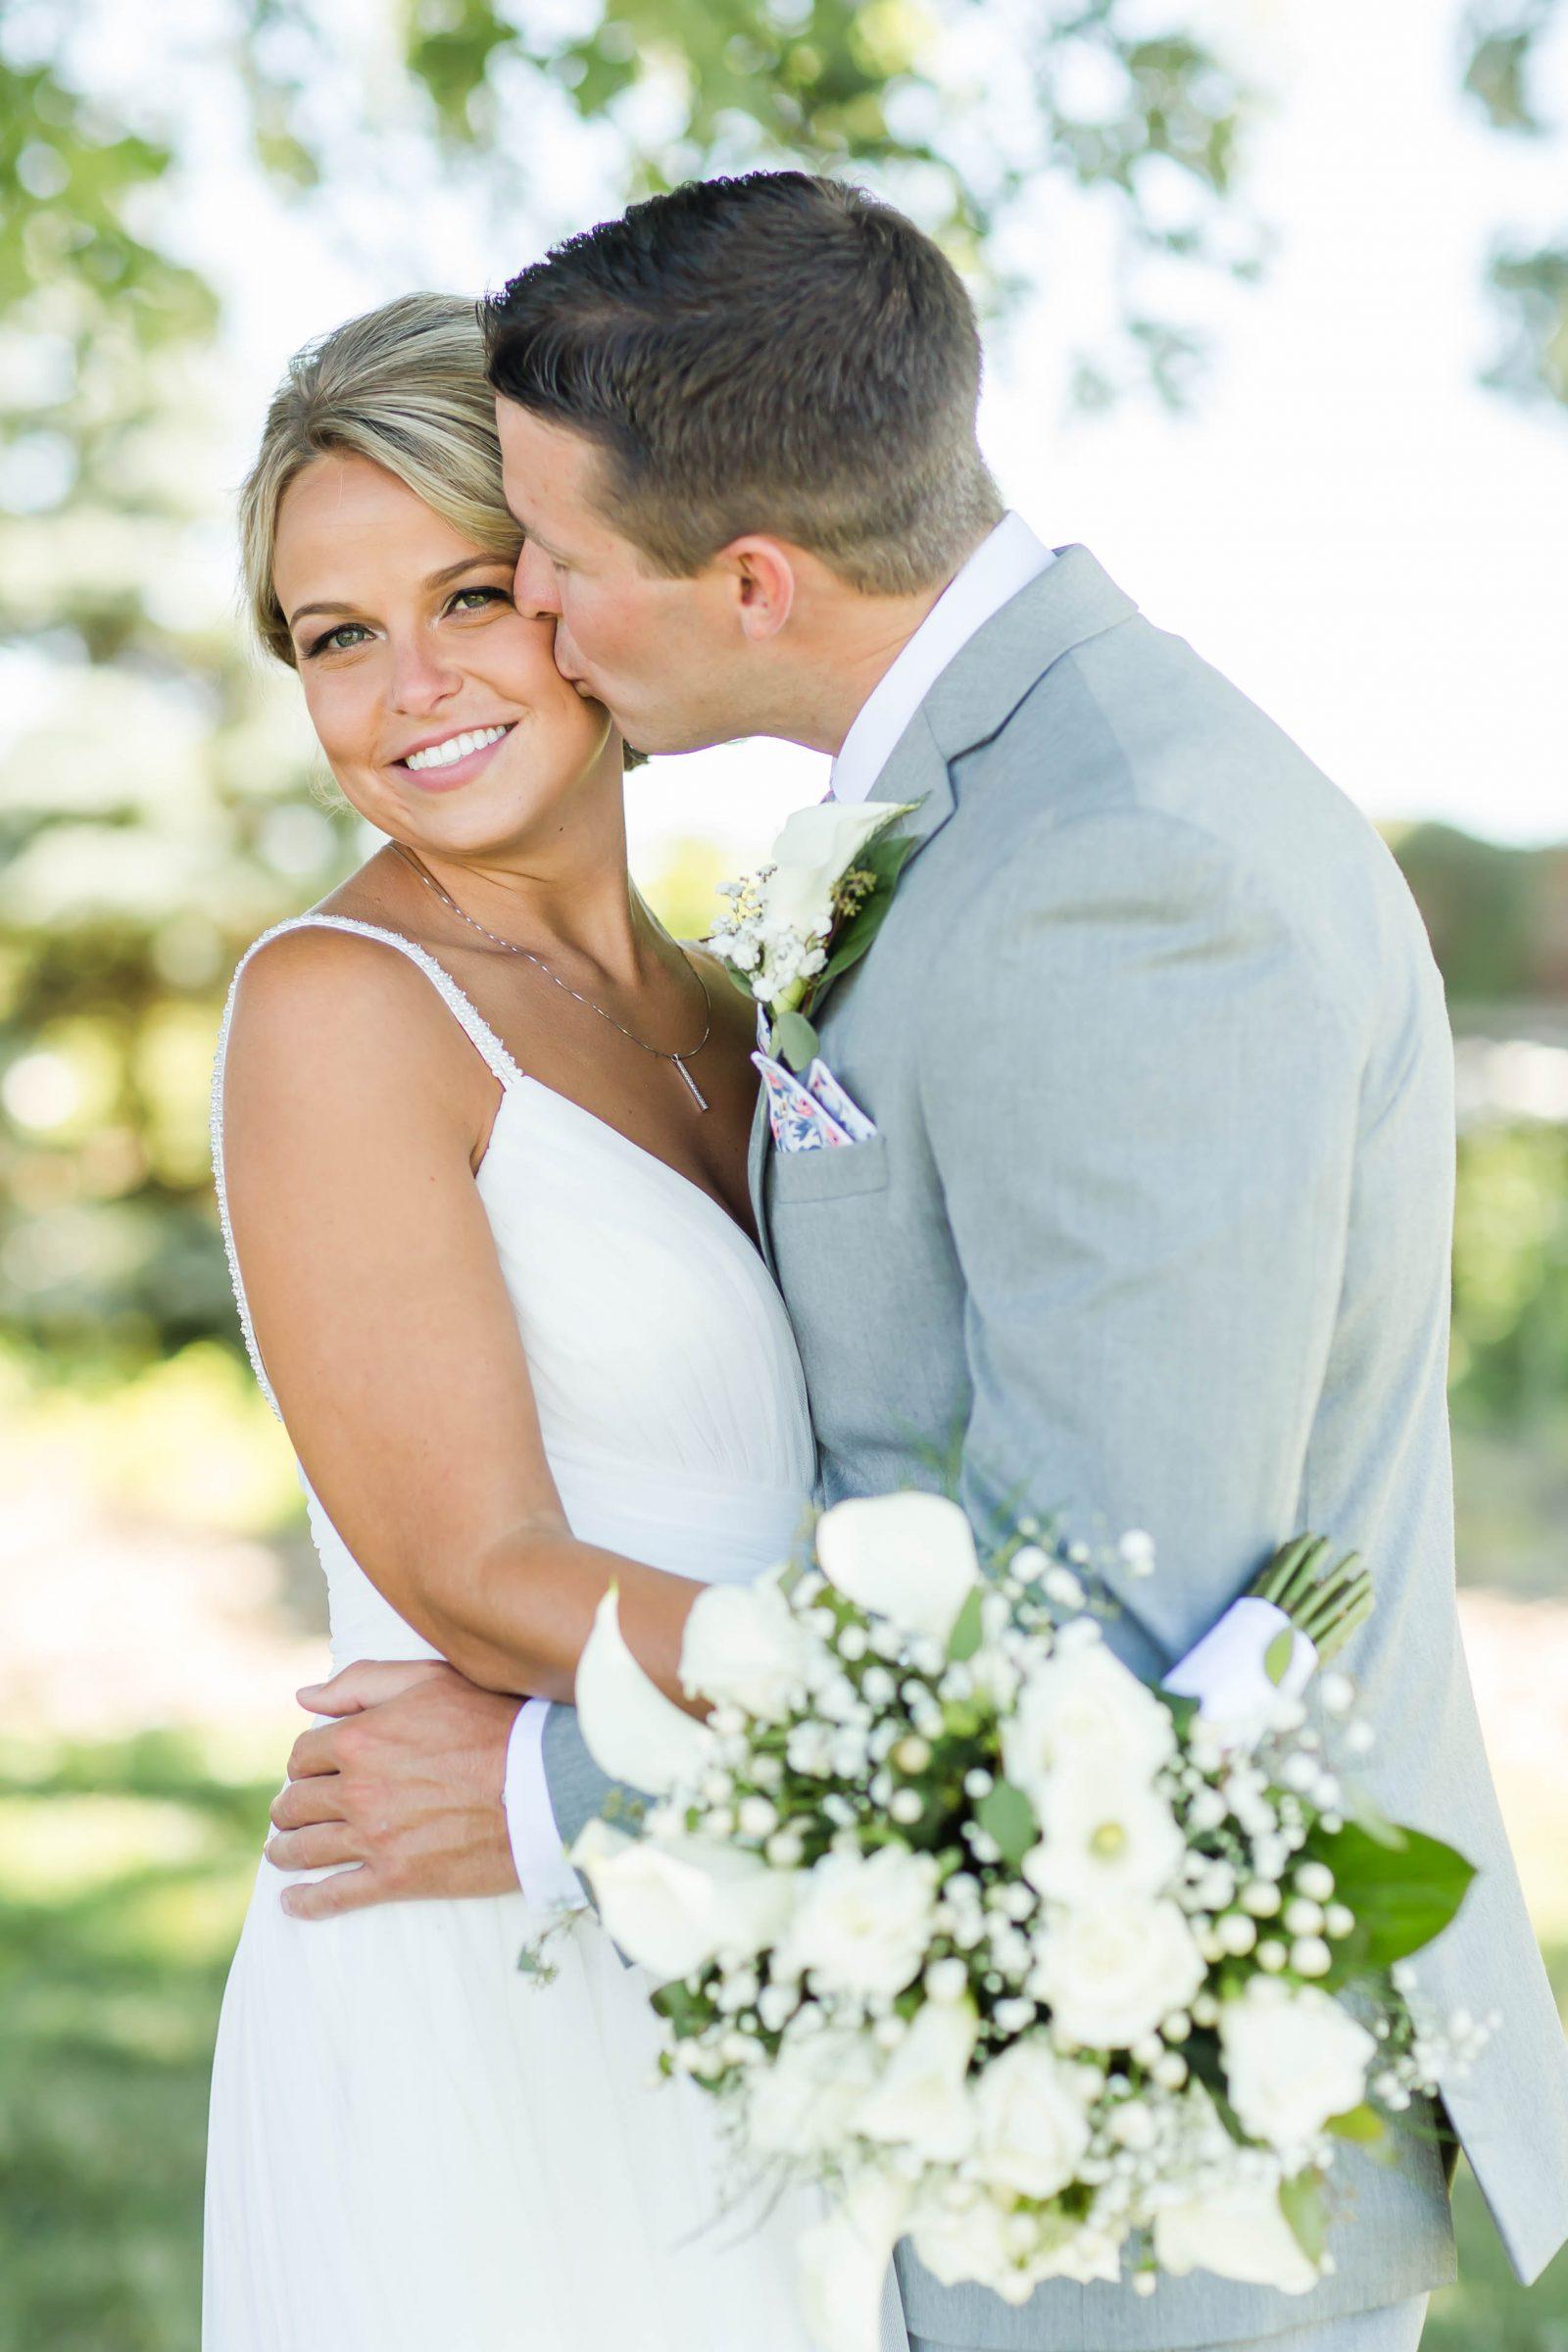 peacock-ridge-summer-wedding-photographer-akron-ohio-loren-jackson-photography-39